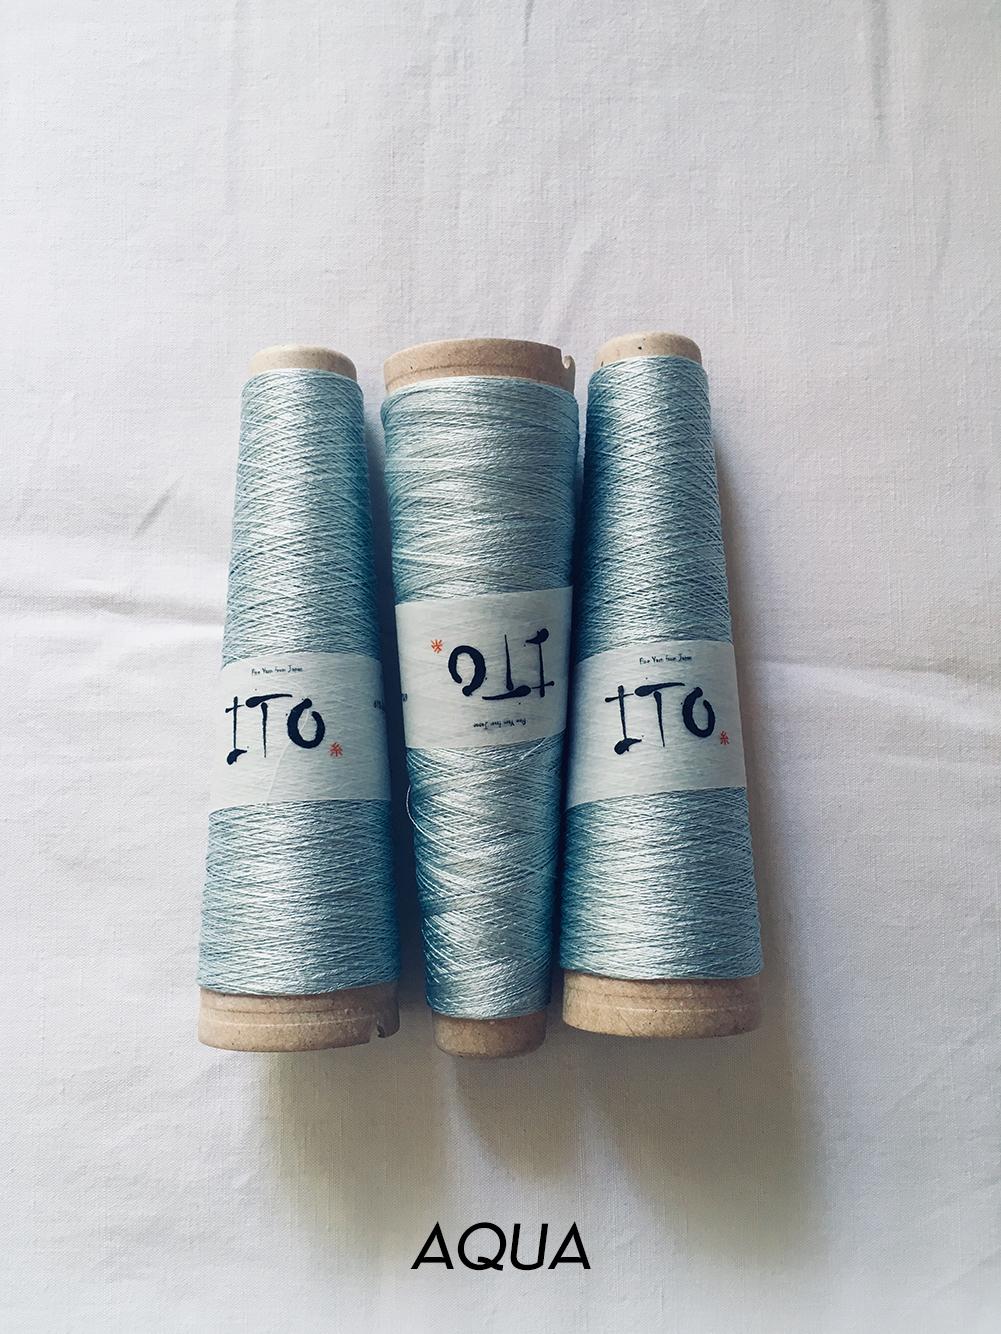 ito_tetsu_aqua_439_wool_done_knitting.jpg